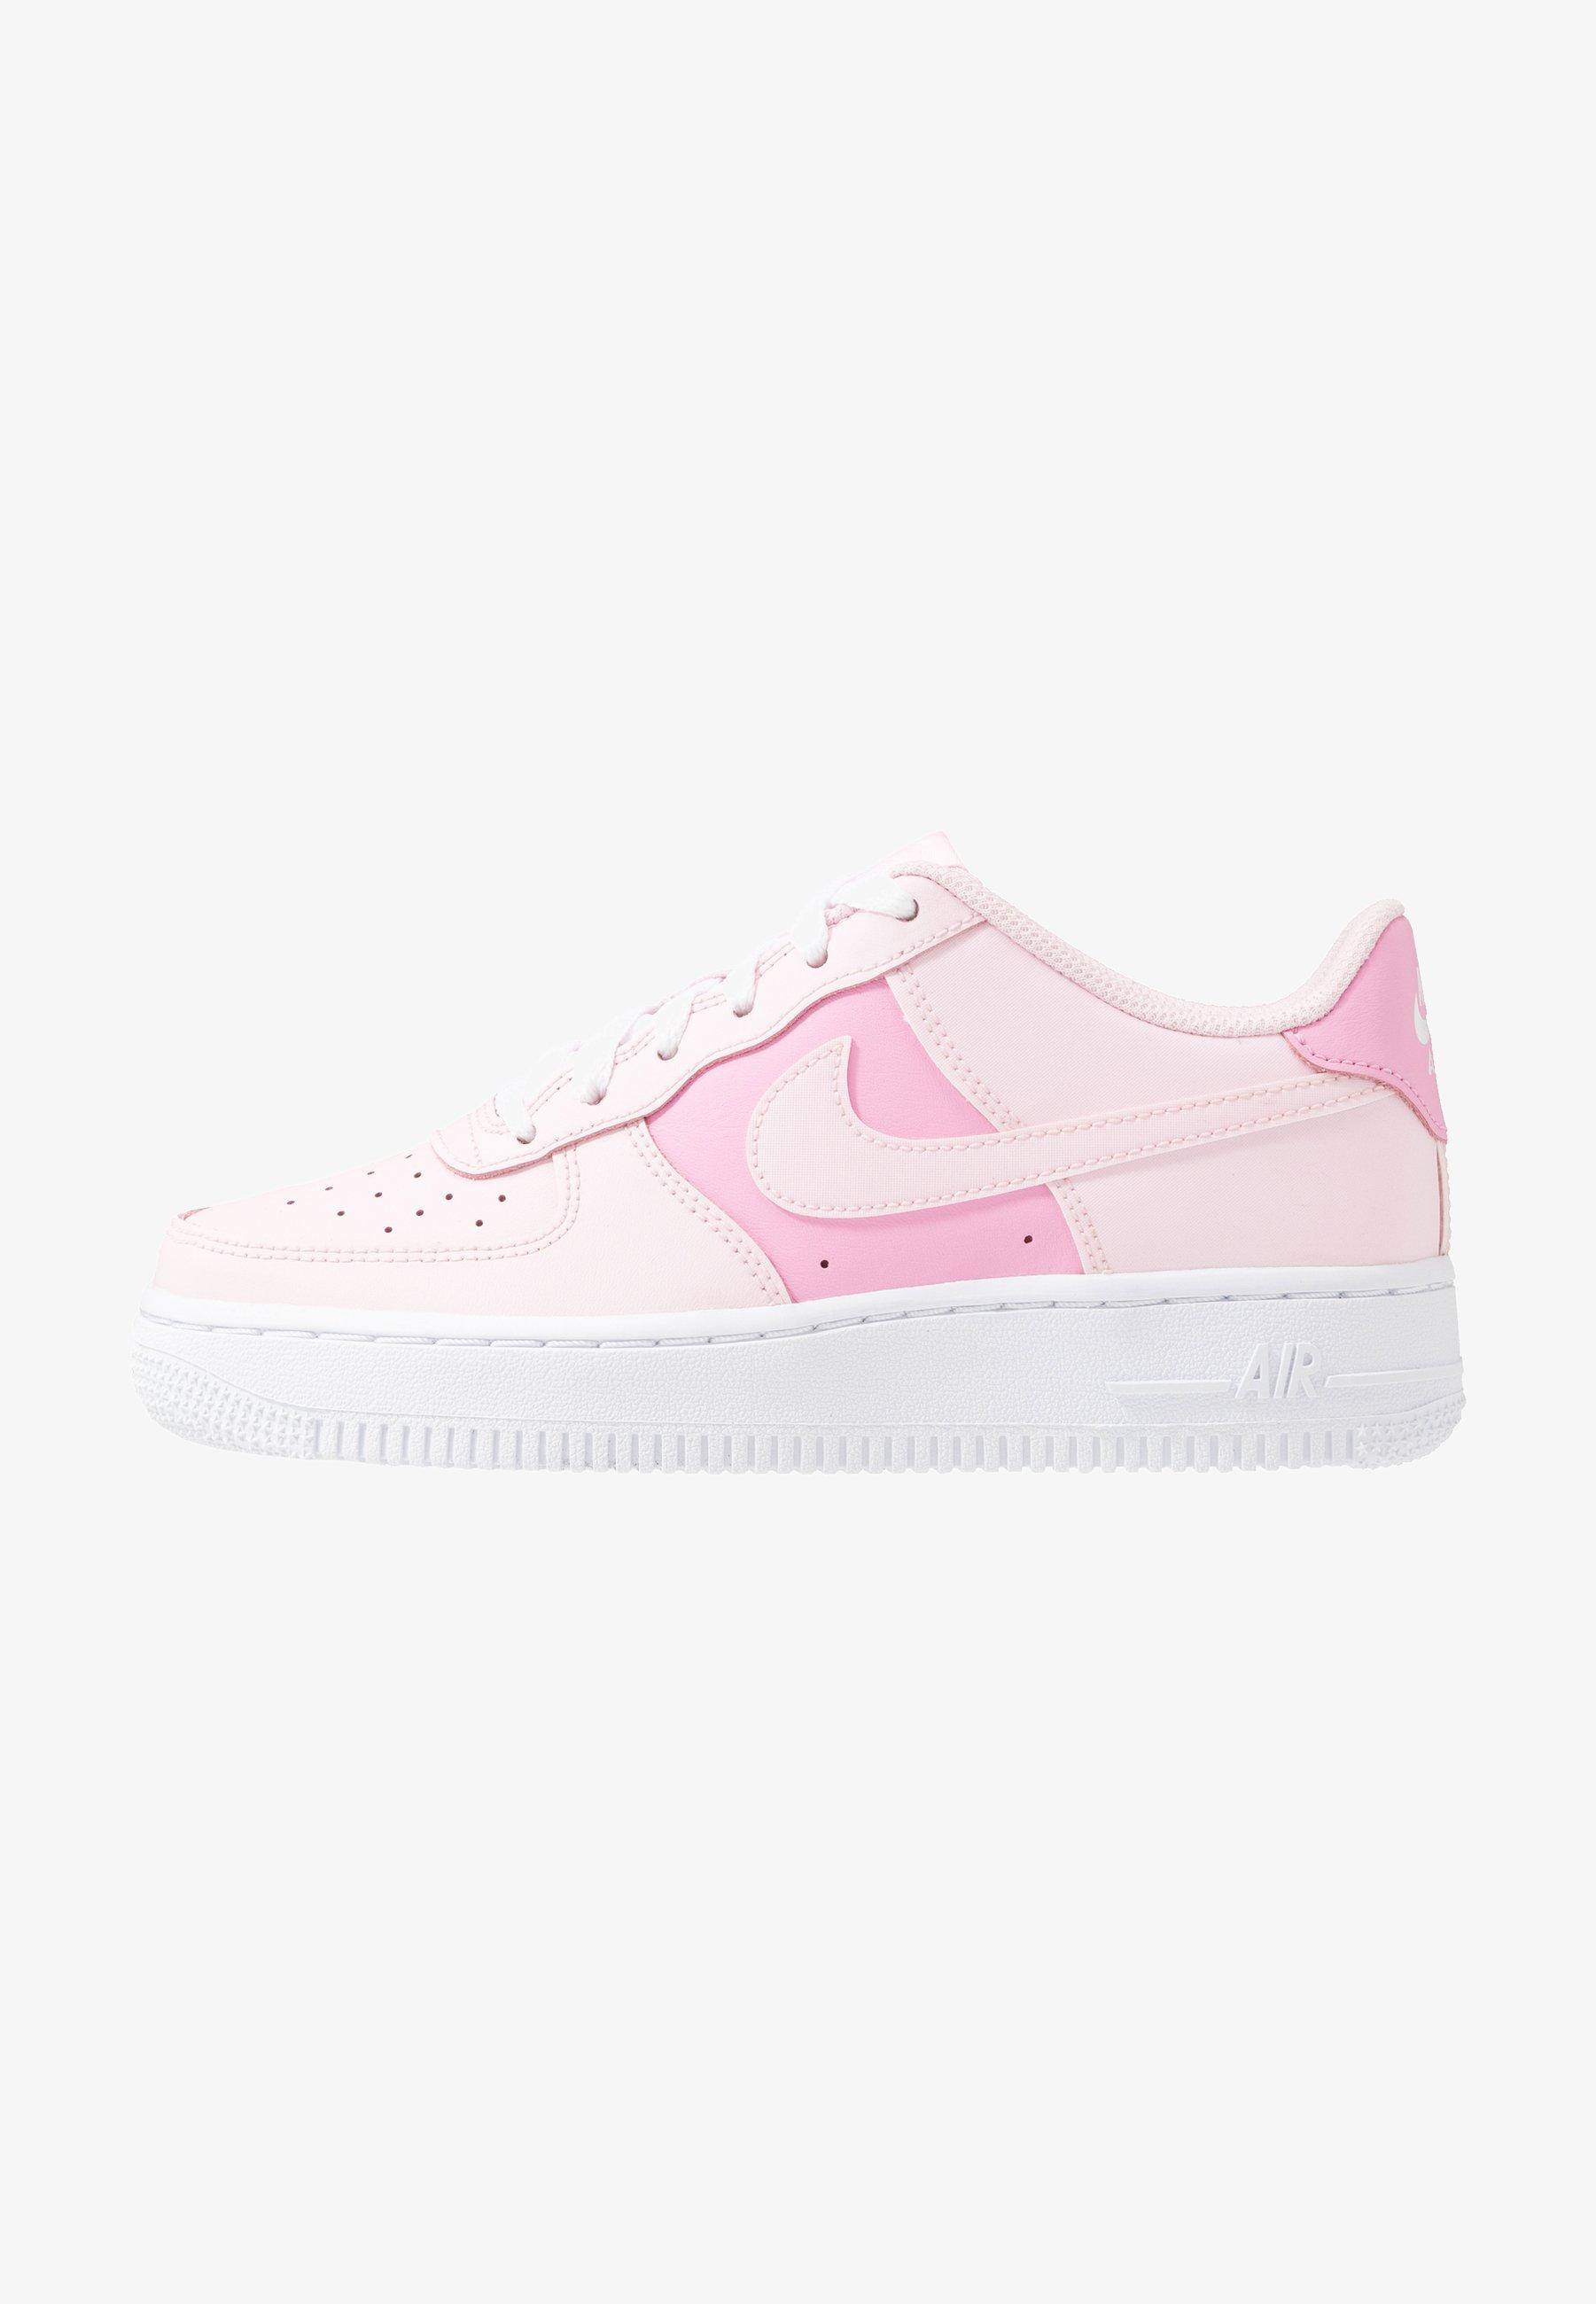 Receptor bofetada asistencia  Nike Sportswear AIR FORCE 1 - Trainers - pink foam/white/pink rise/pink -  Zalando.ie